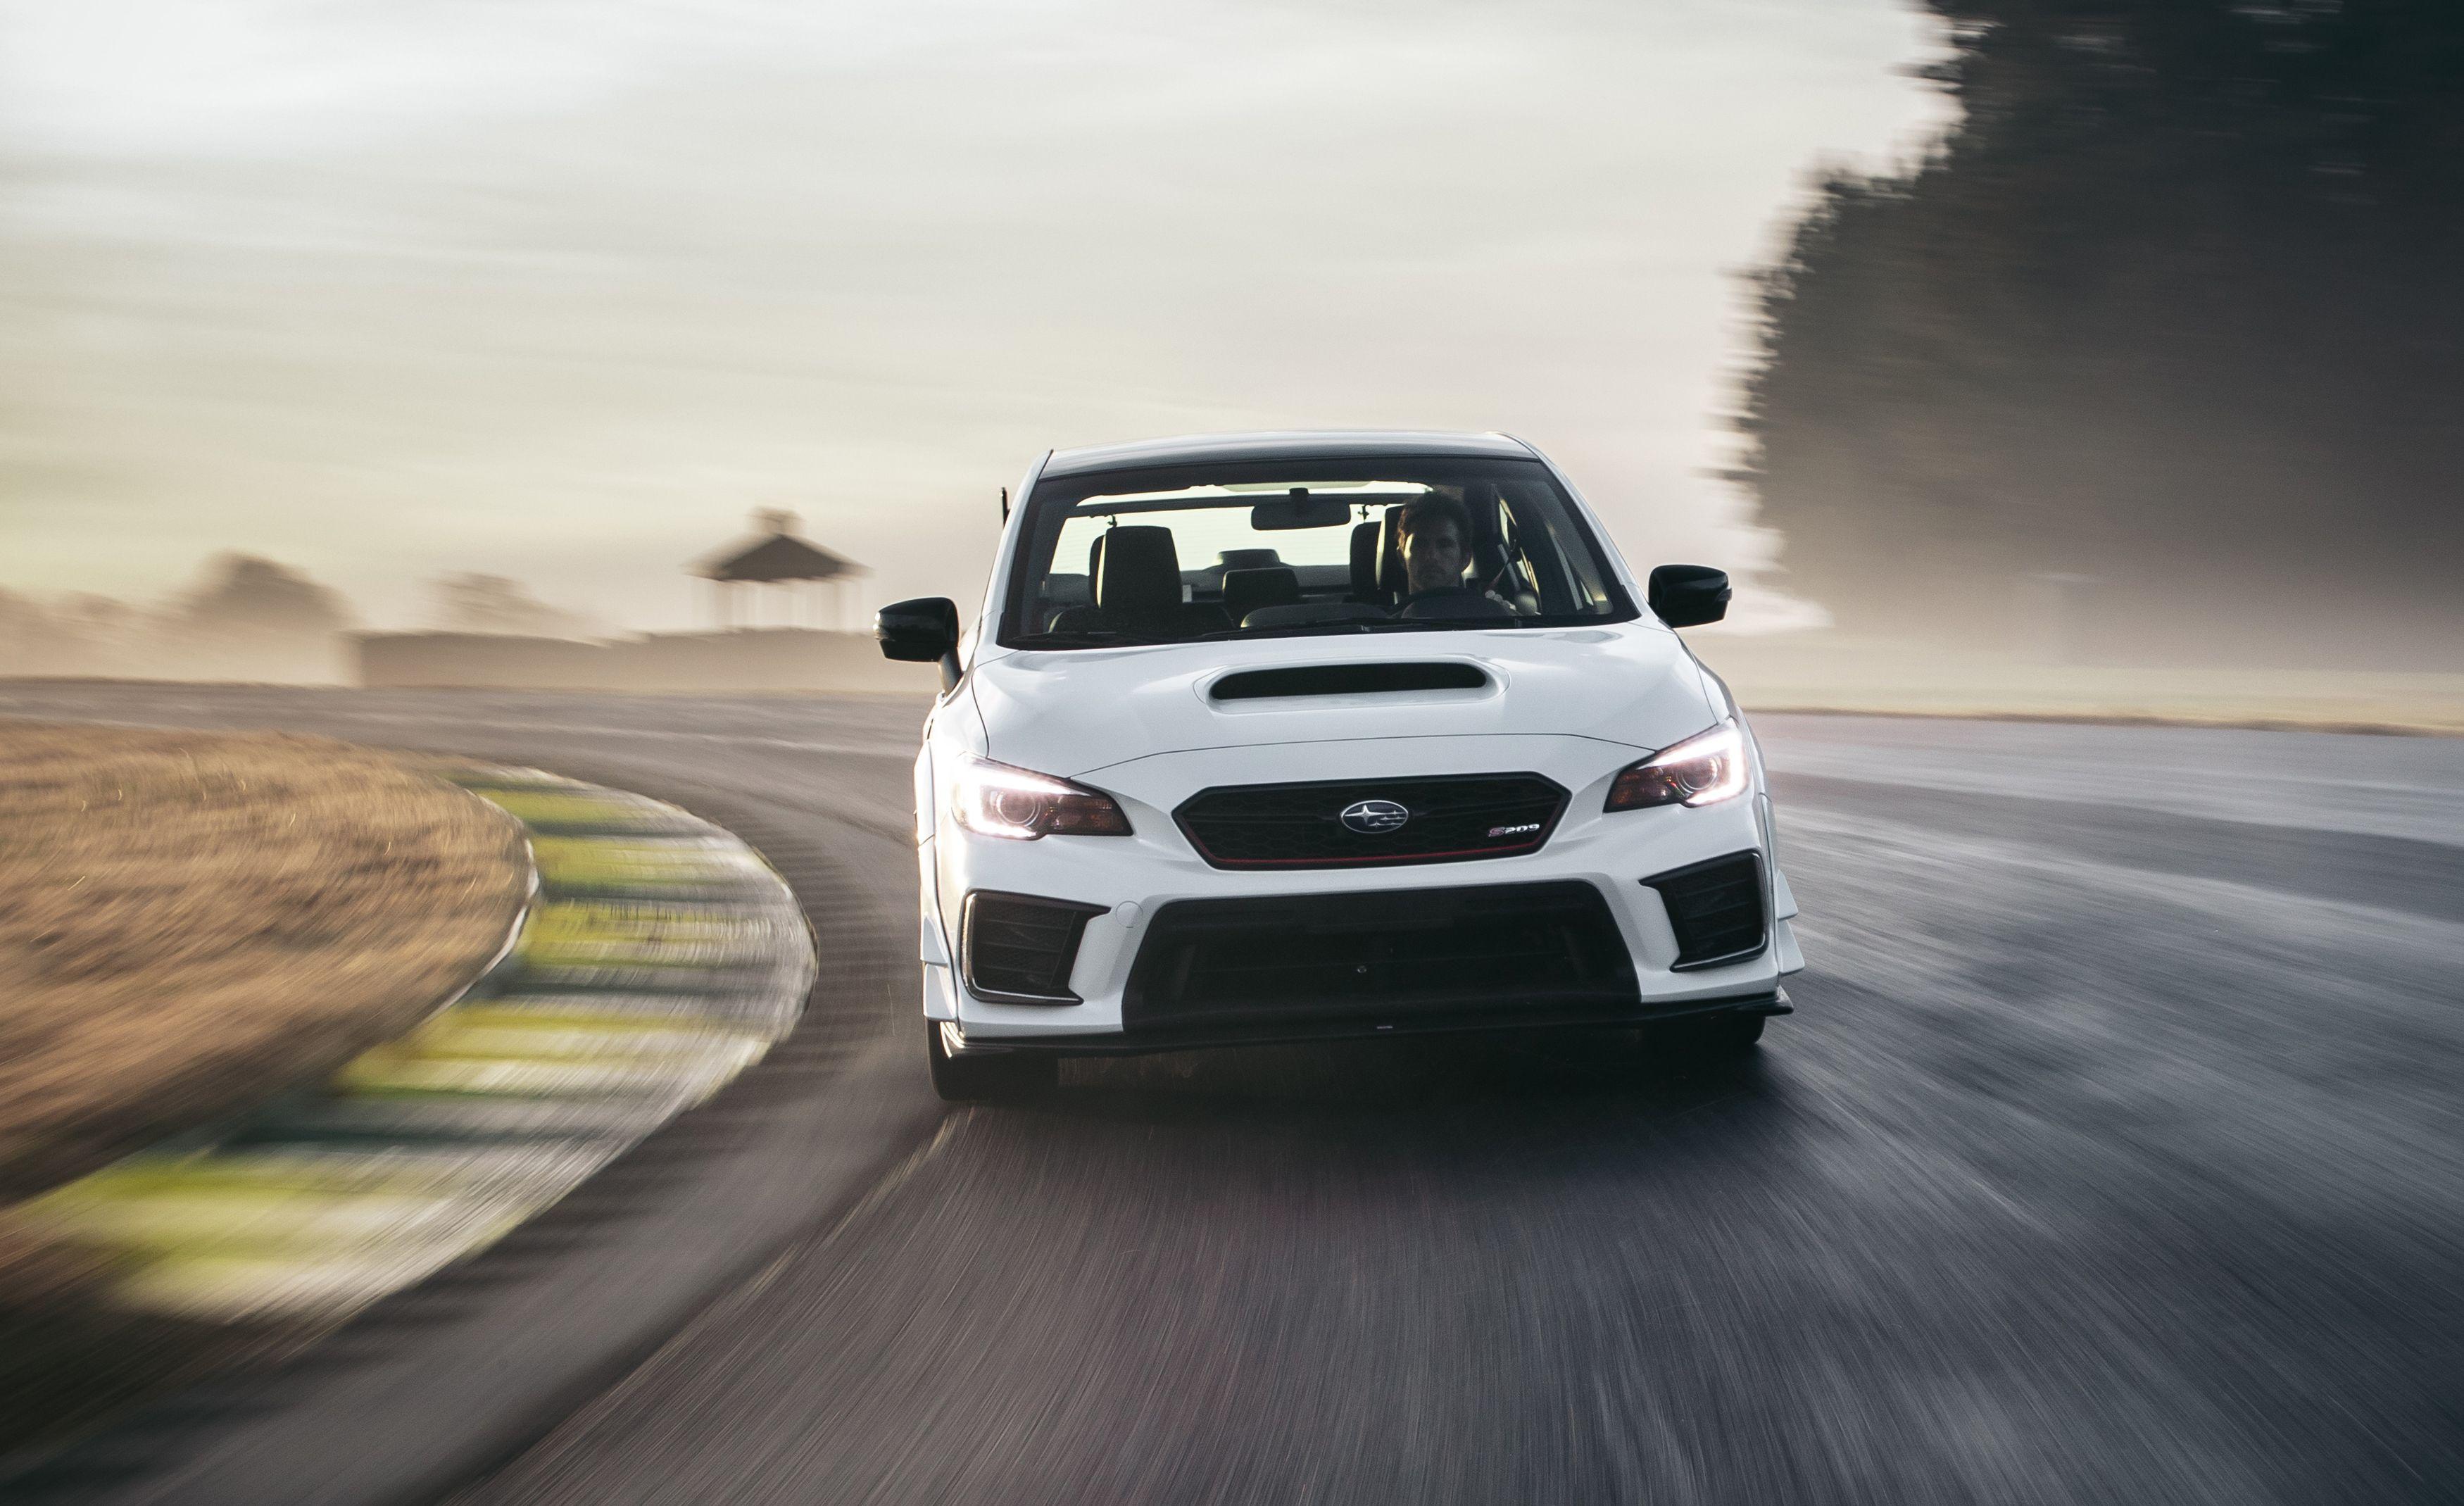 The 2019 Subaru STI S209 Brings Long-Awaited Power Increase to the Proto-Rally Patriarch